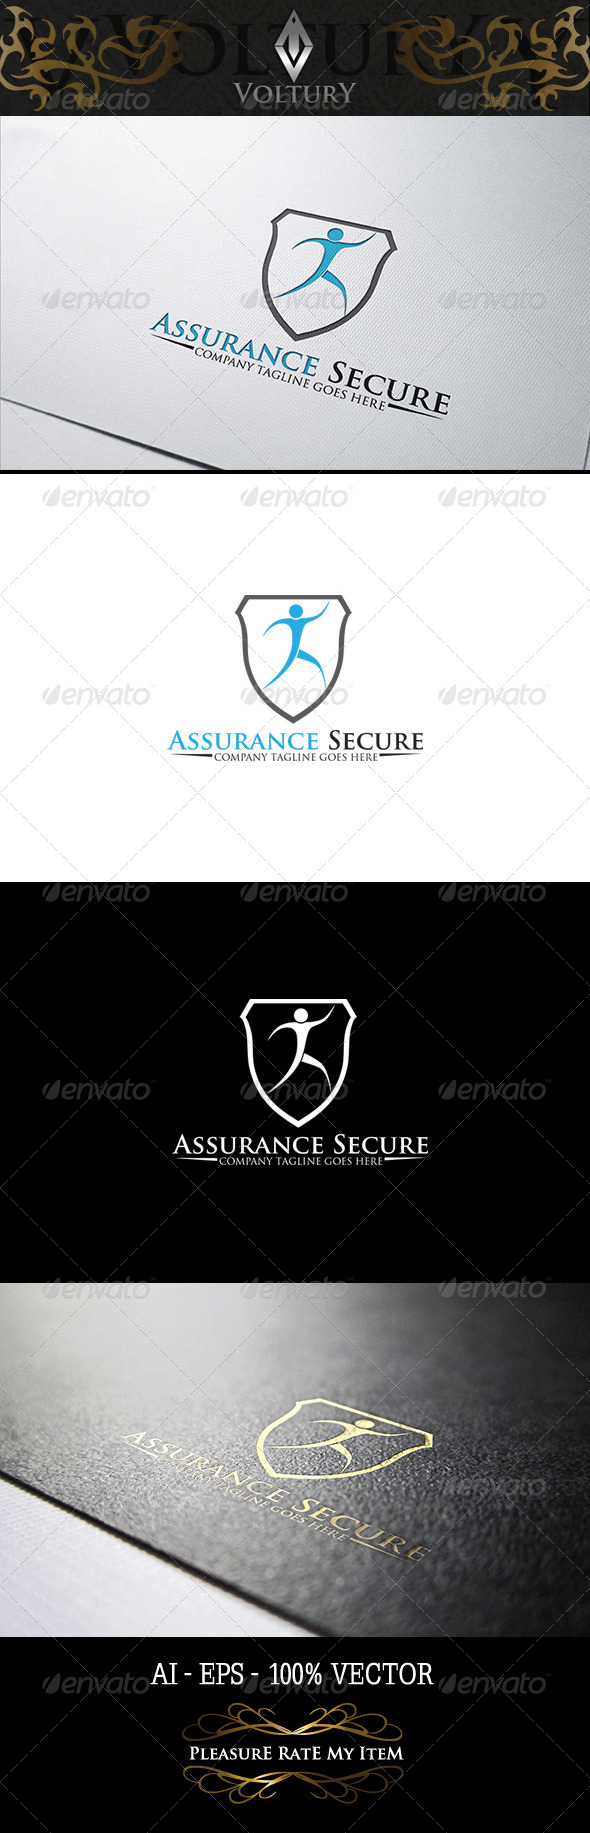 Assurance Secure Logo